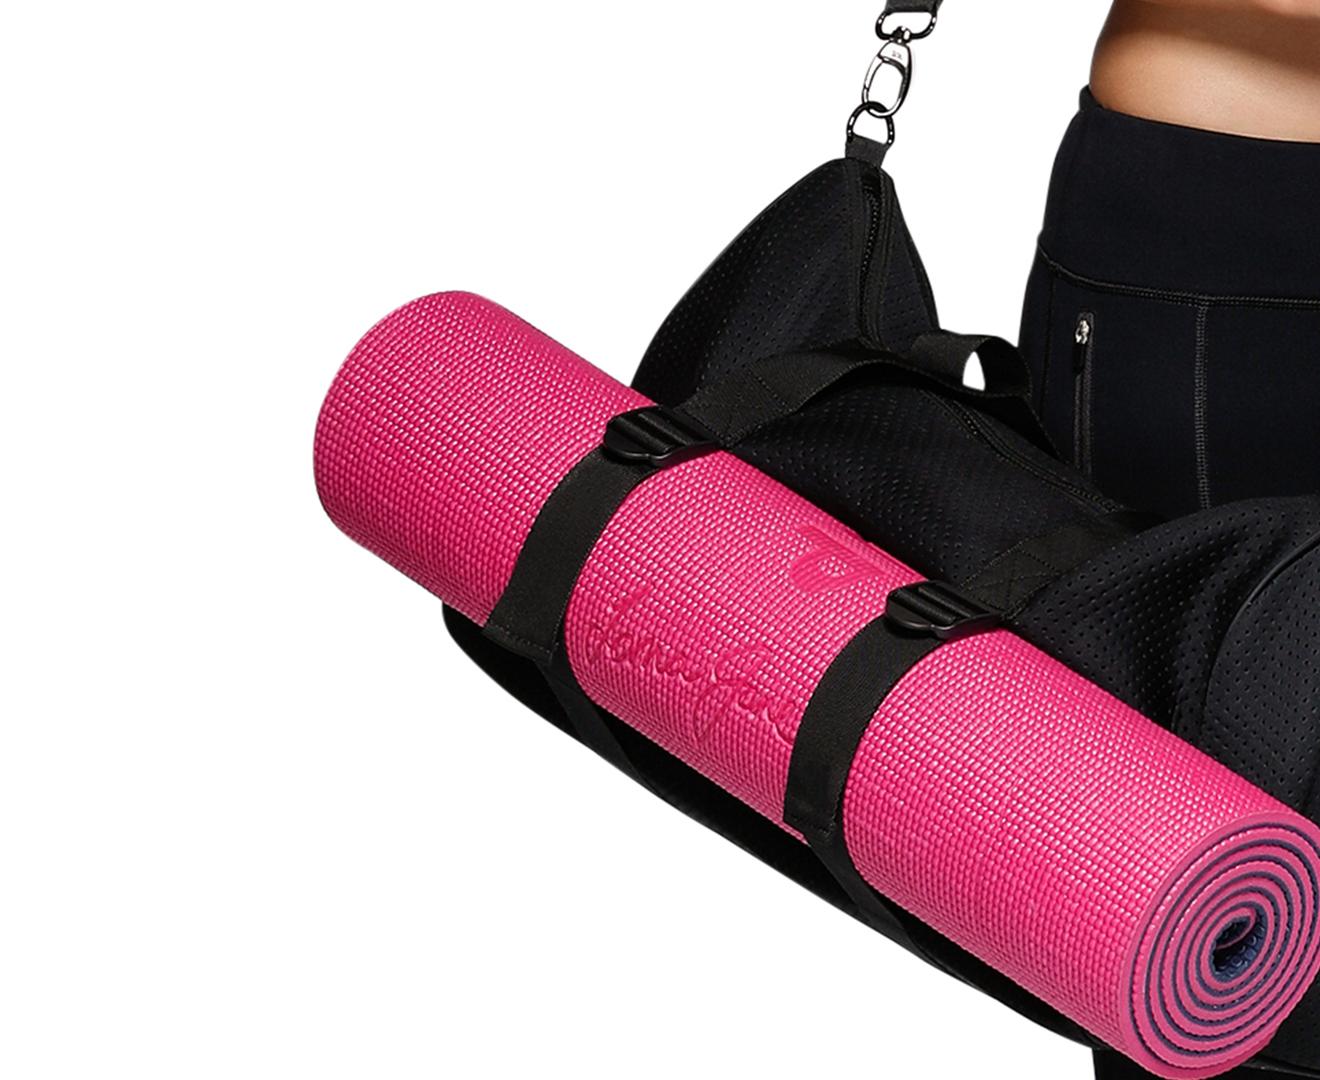 Lorna Jane Multi Purpose Gym Bag Black Great Daily